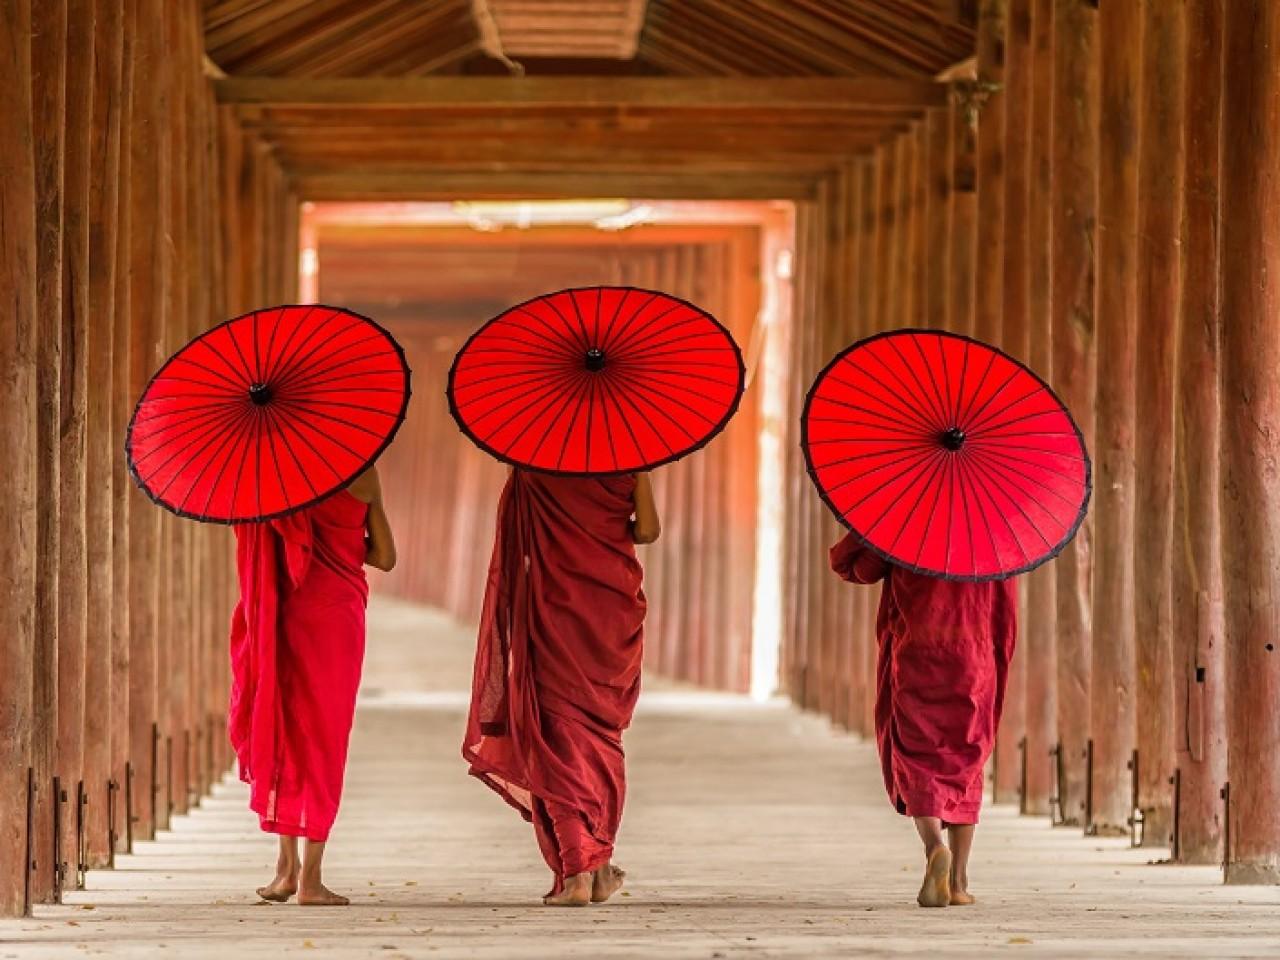 MYANMAR - BIRMANIA AUTENTICA